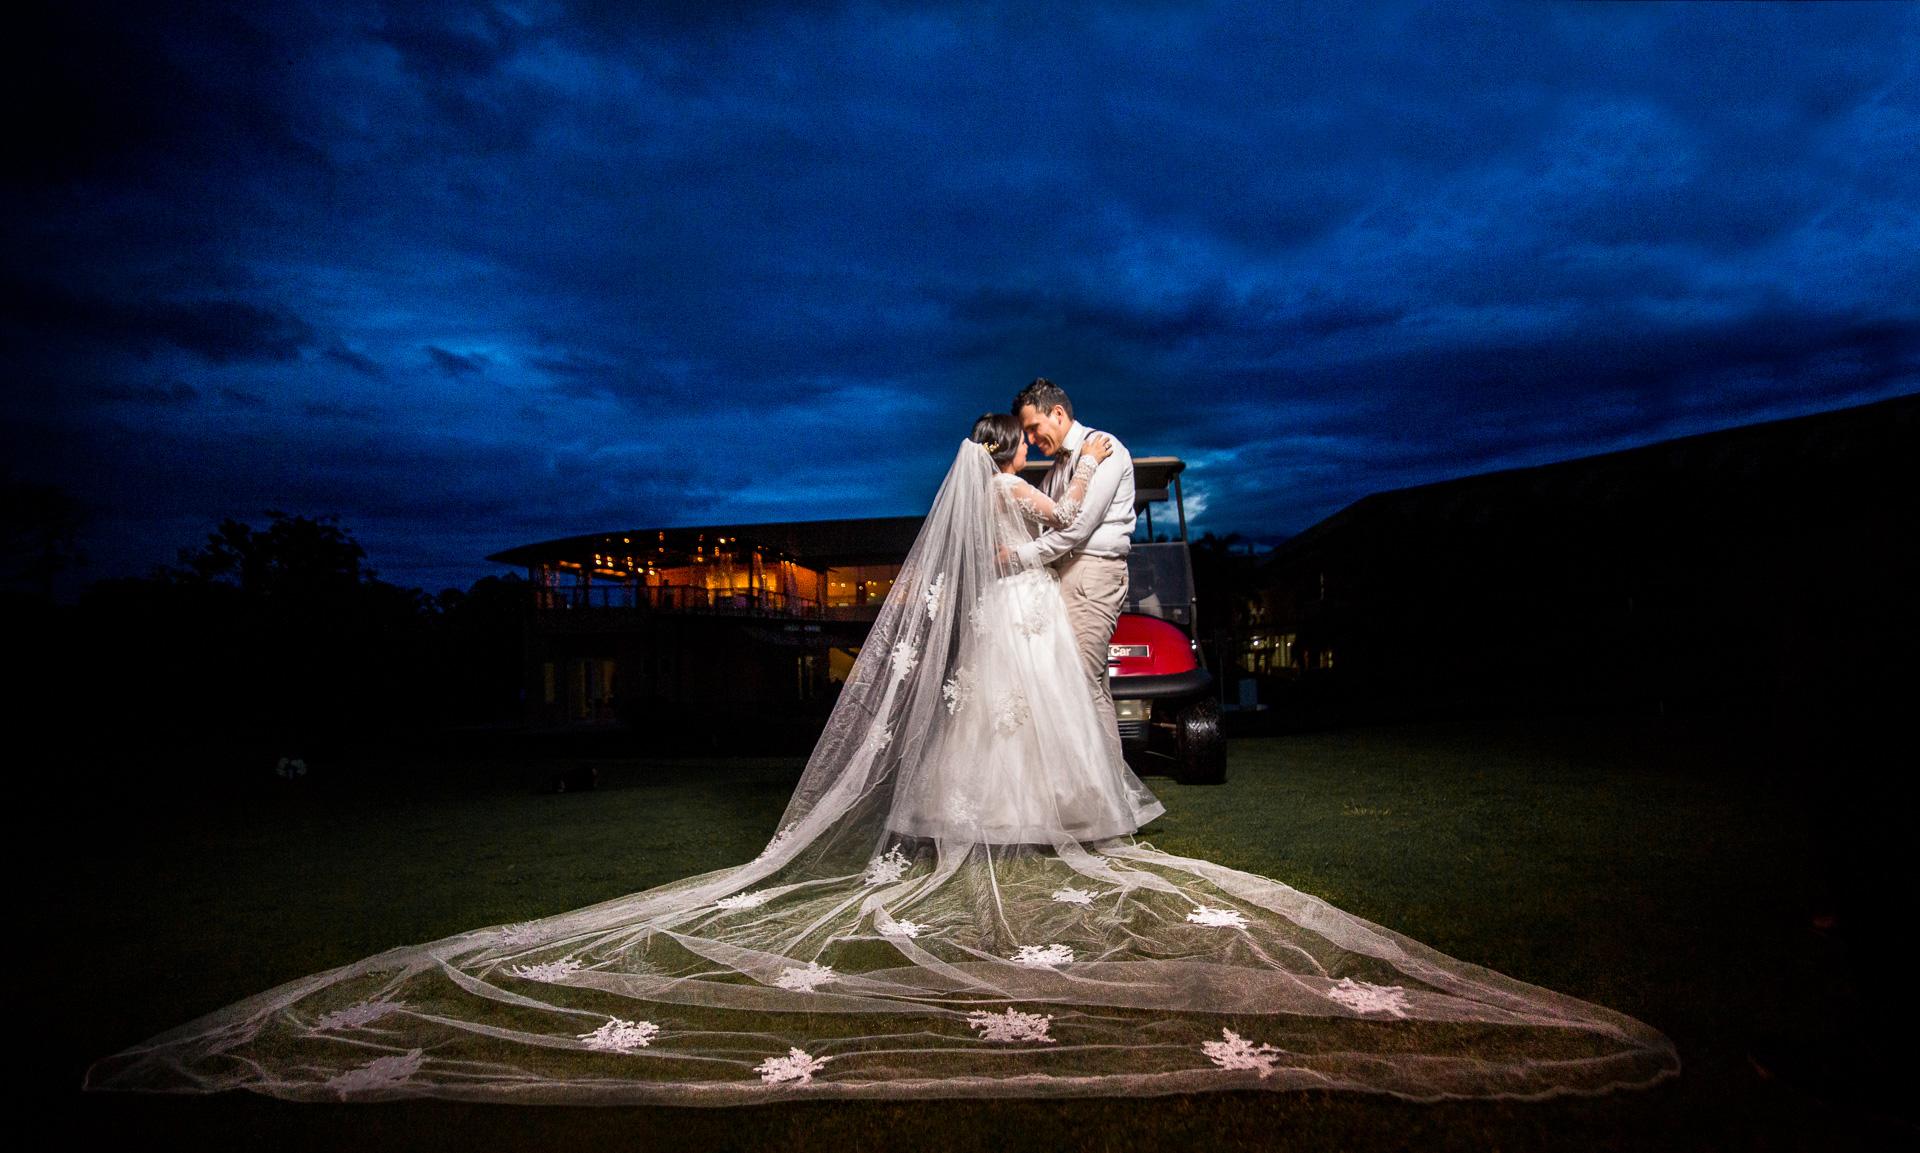 Fotógrafos-de-bodas-en-Colombia-Sthephanie-y-David-45 STEPHANIE + DAVID